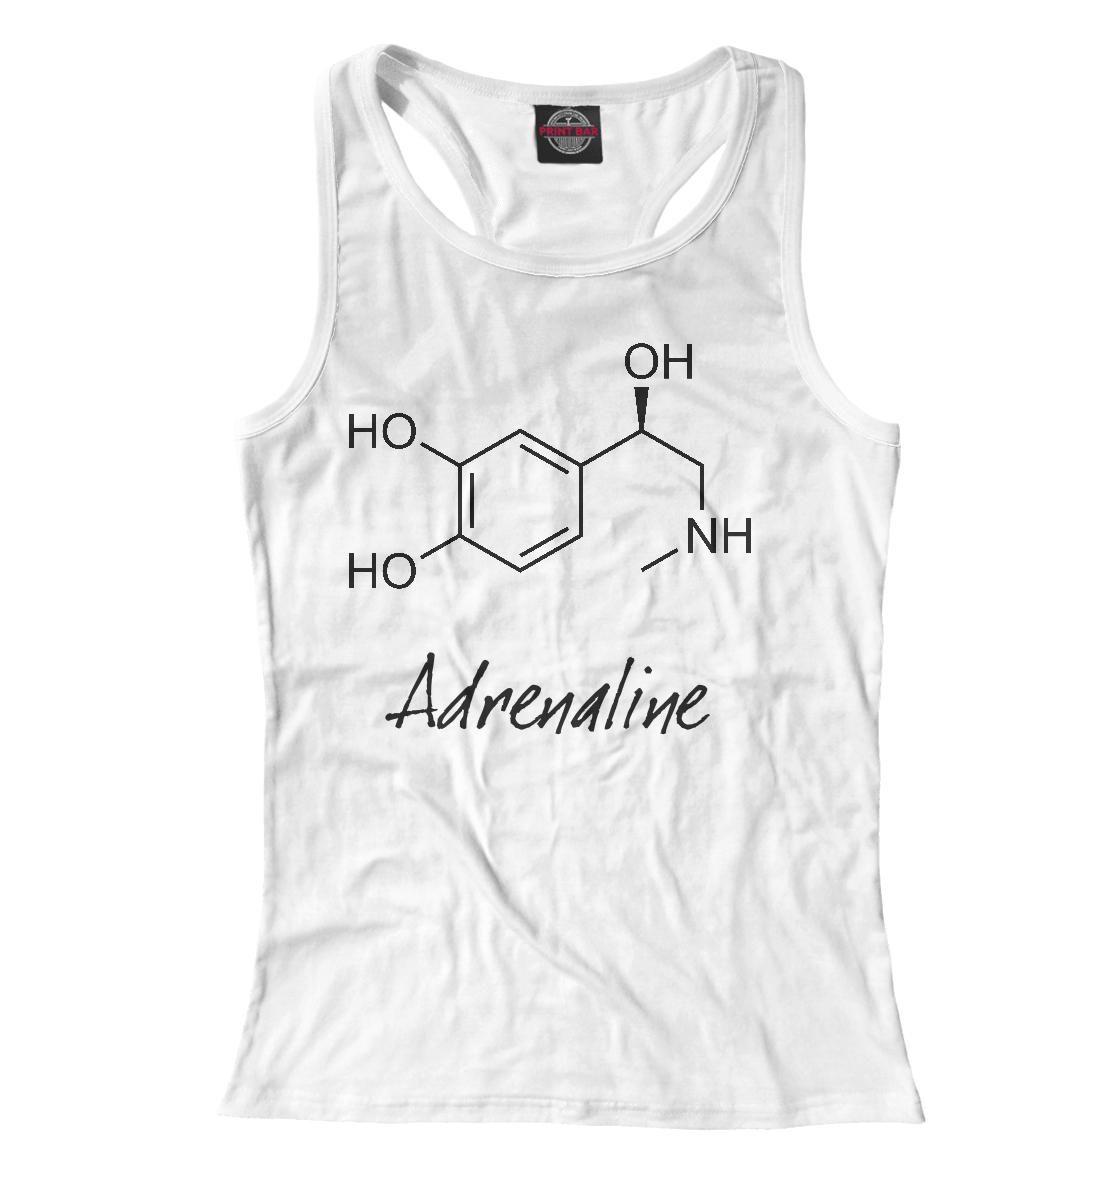 Купить Химия Адреналин, Printbar, Майки борцовки, APD-946292-mayb-1